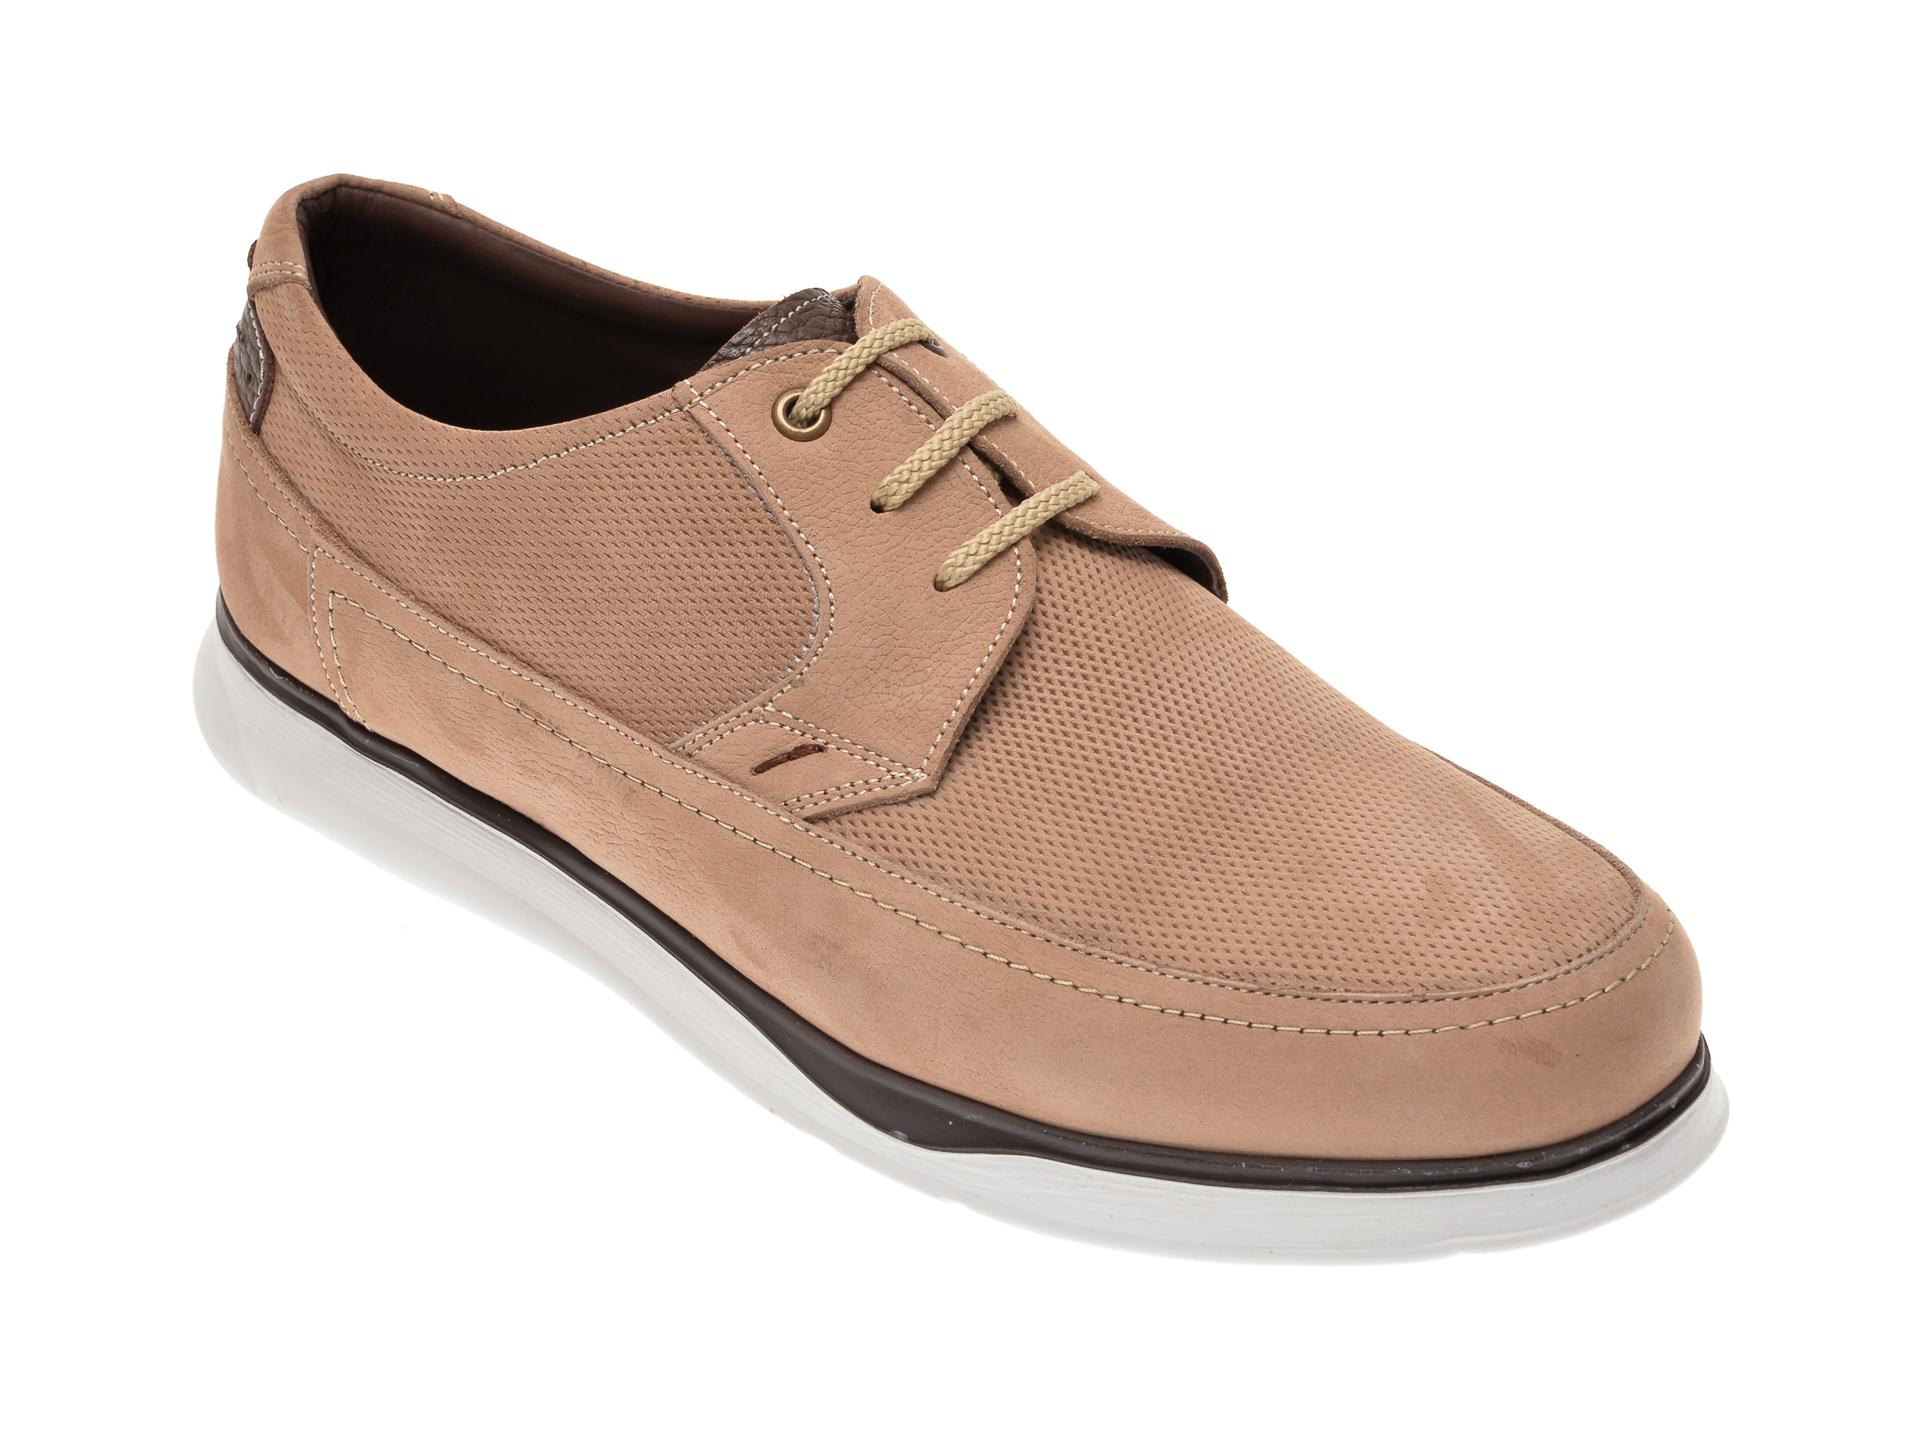 Pantofi OTTER bej, 19332, din piele intoarsa